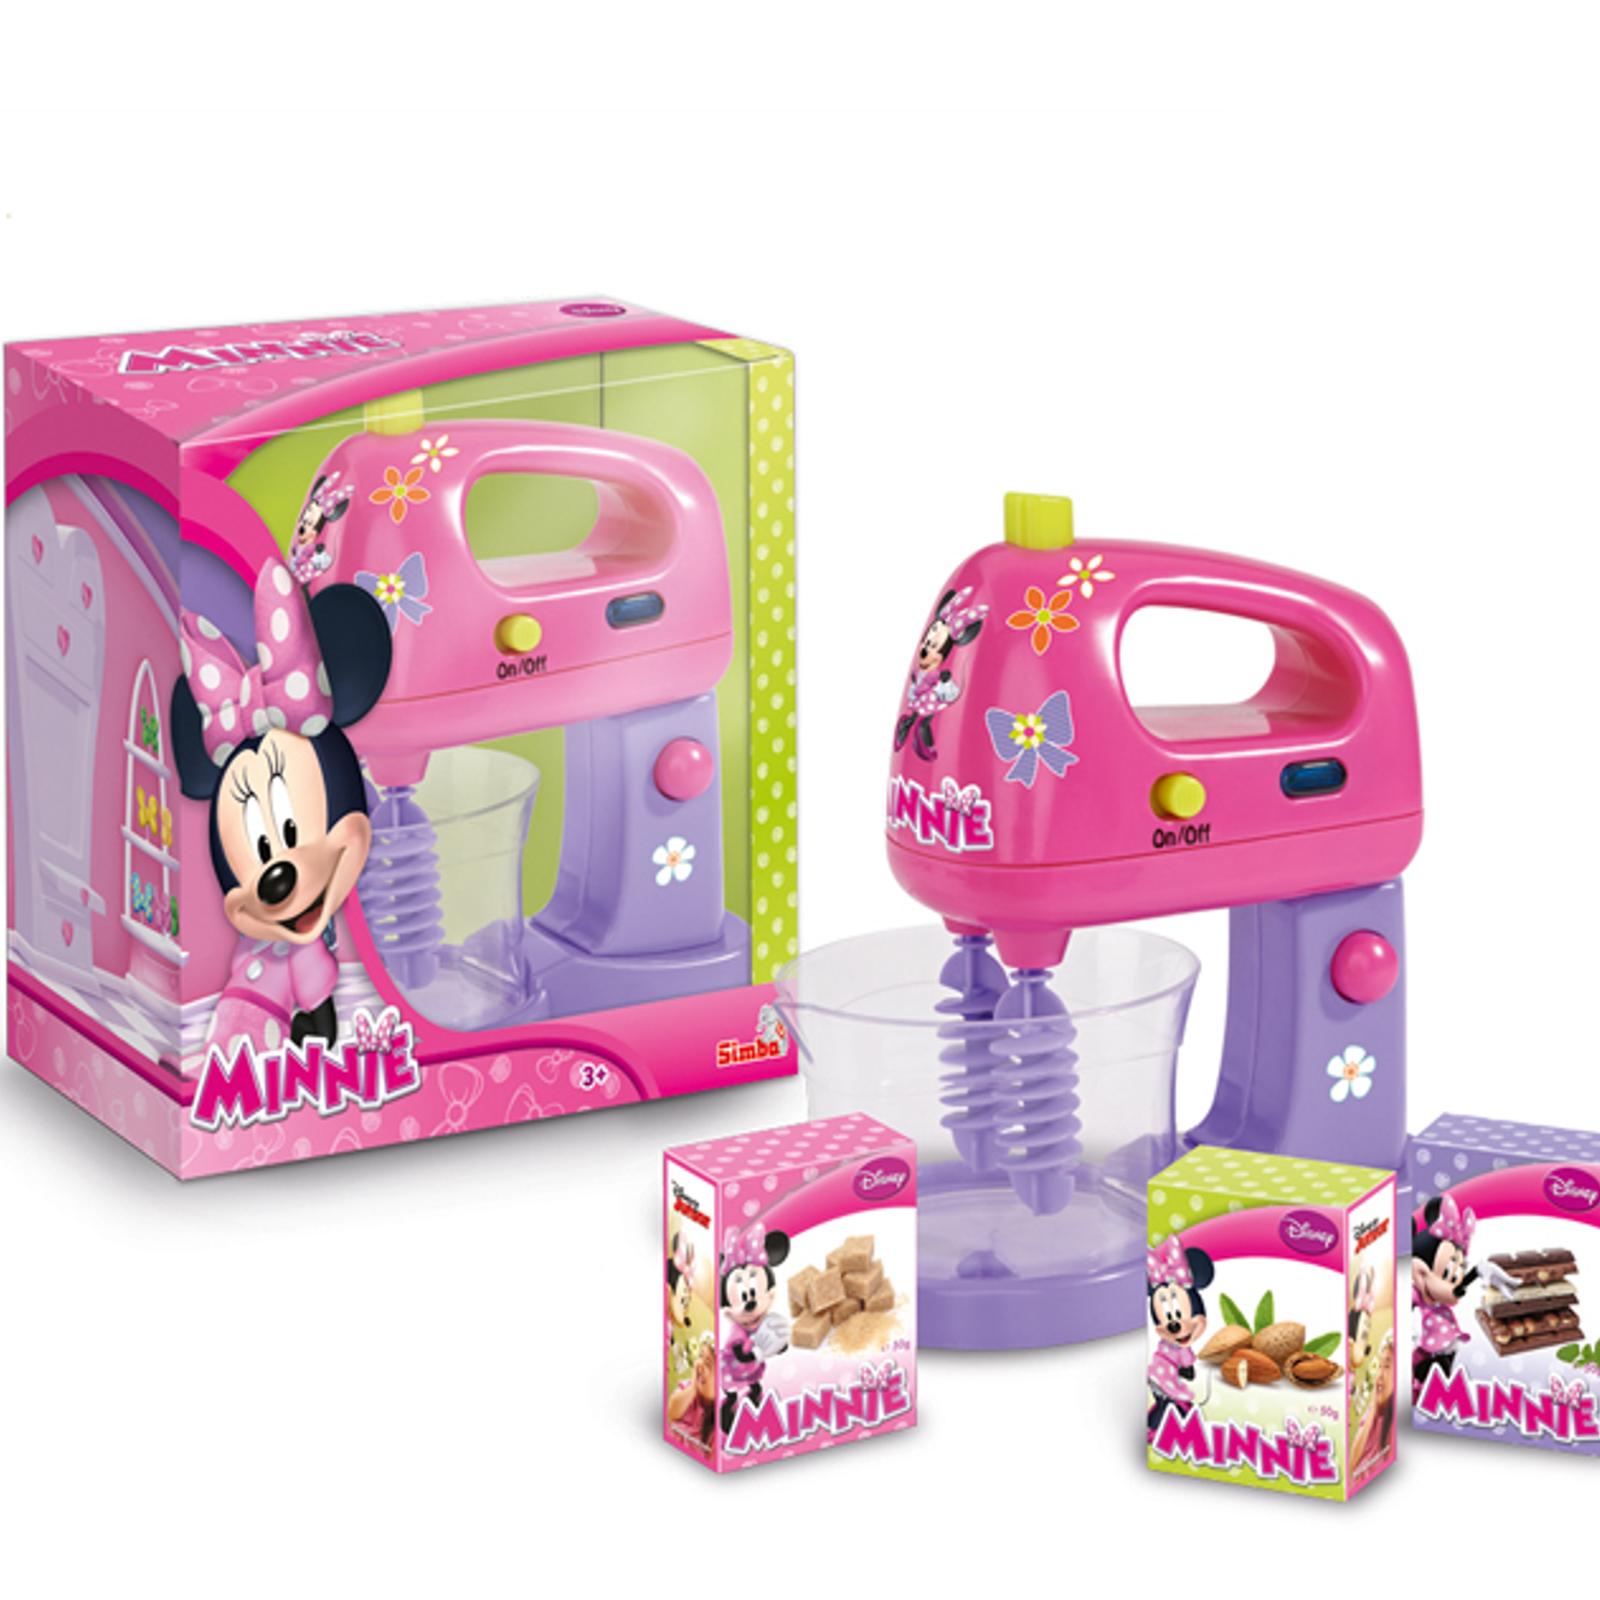 ������� ����� Simba �������� ������� Minnie Mouse ����� ���� (20 ��.)